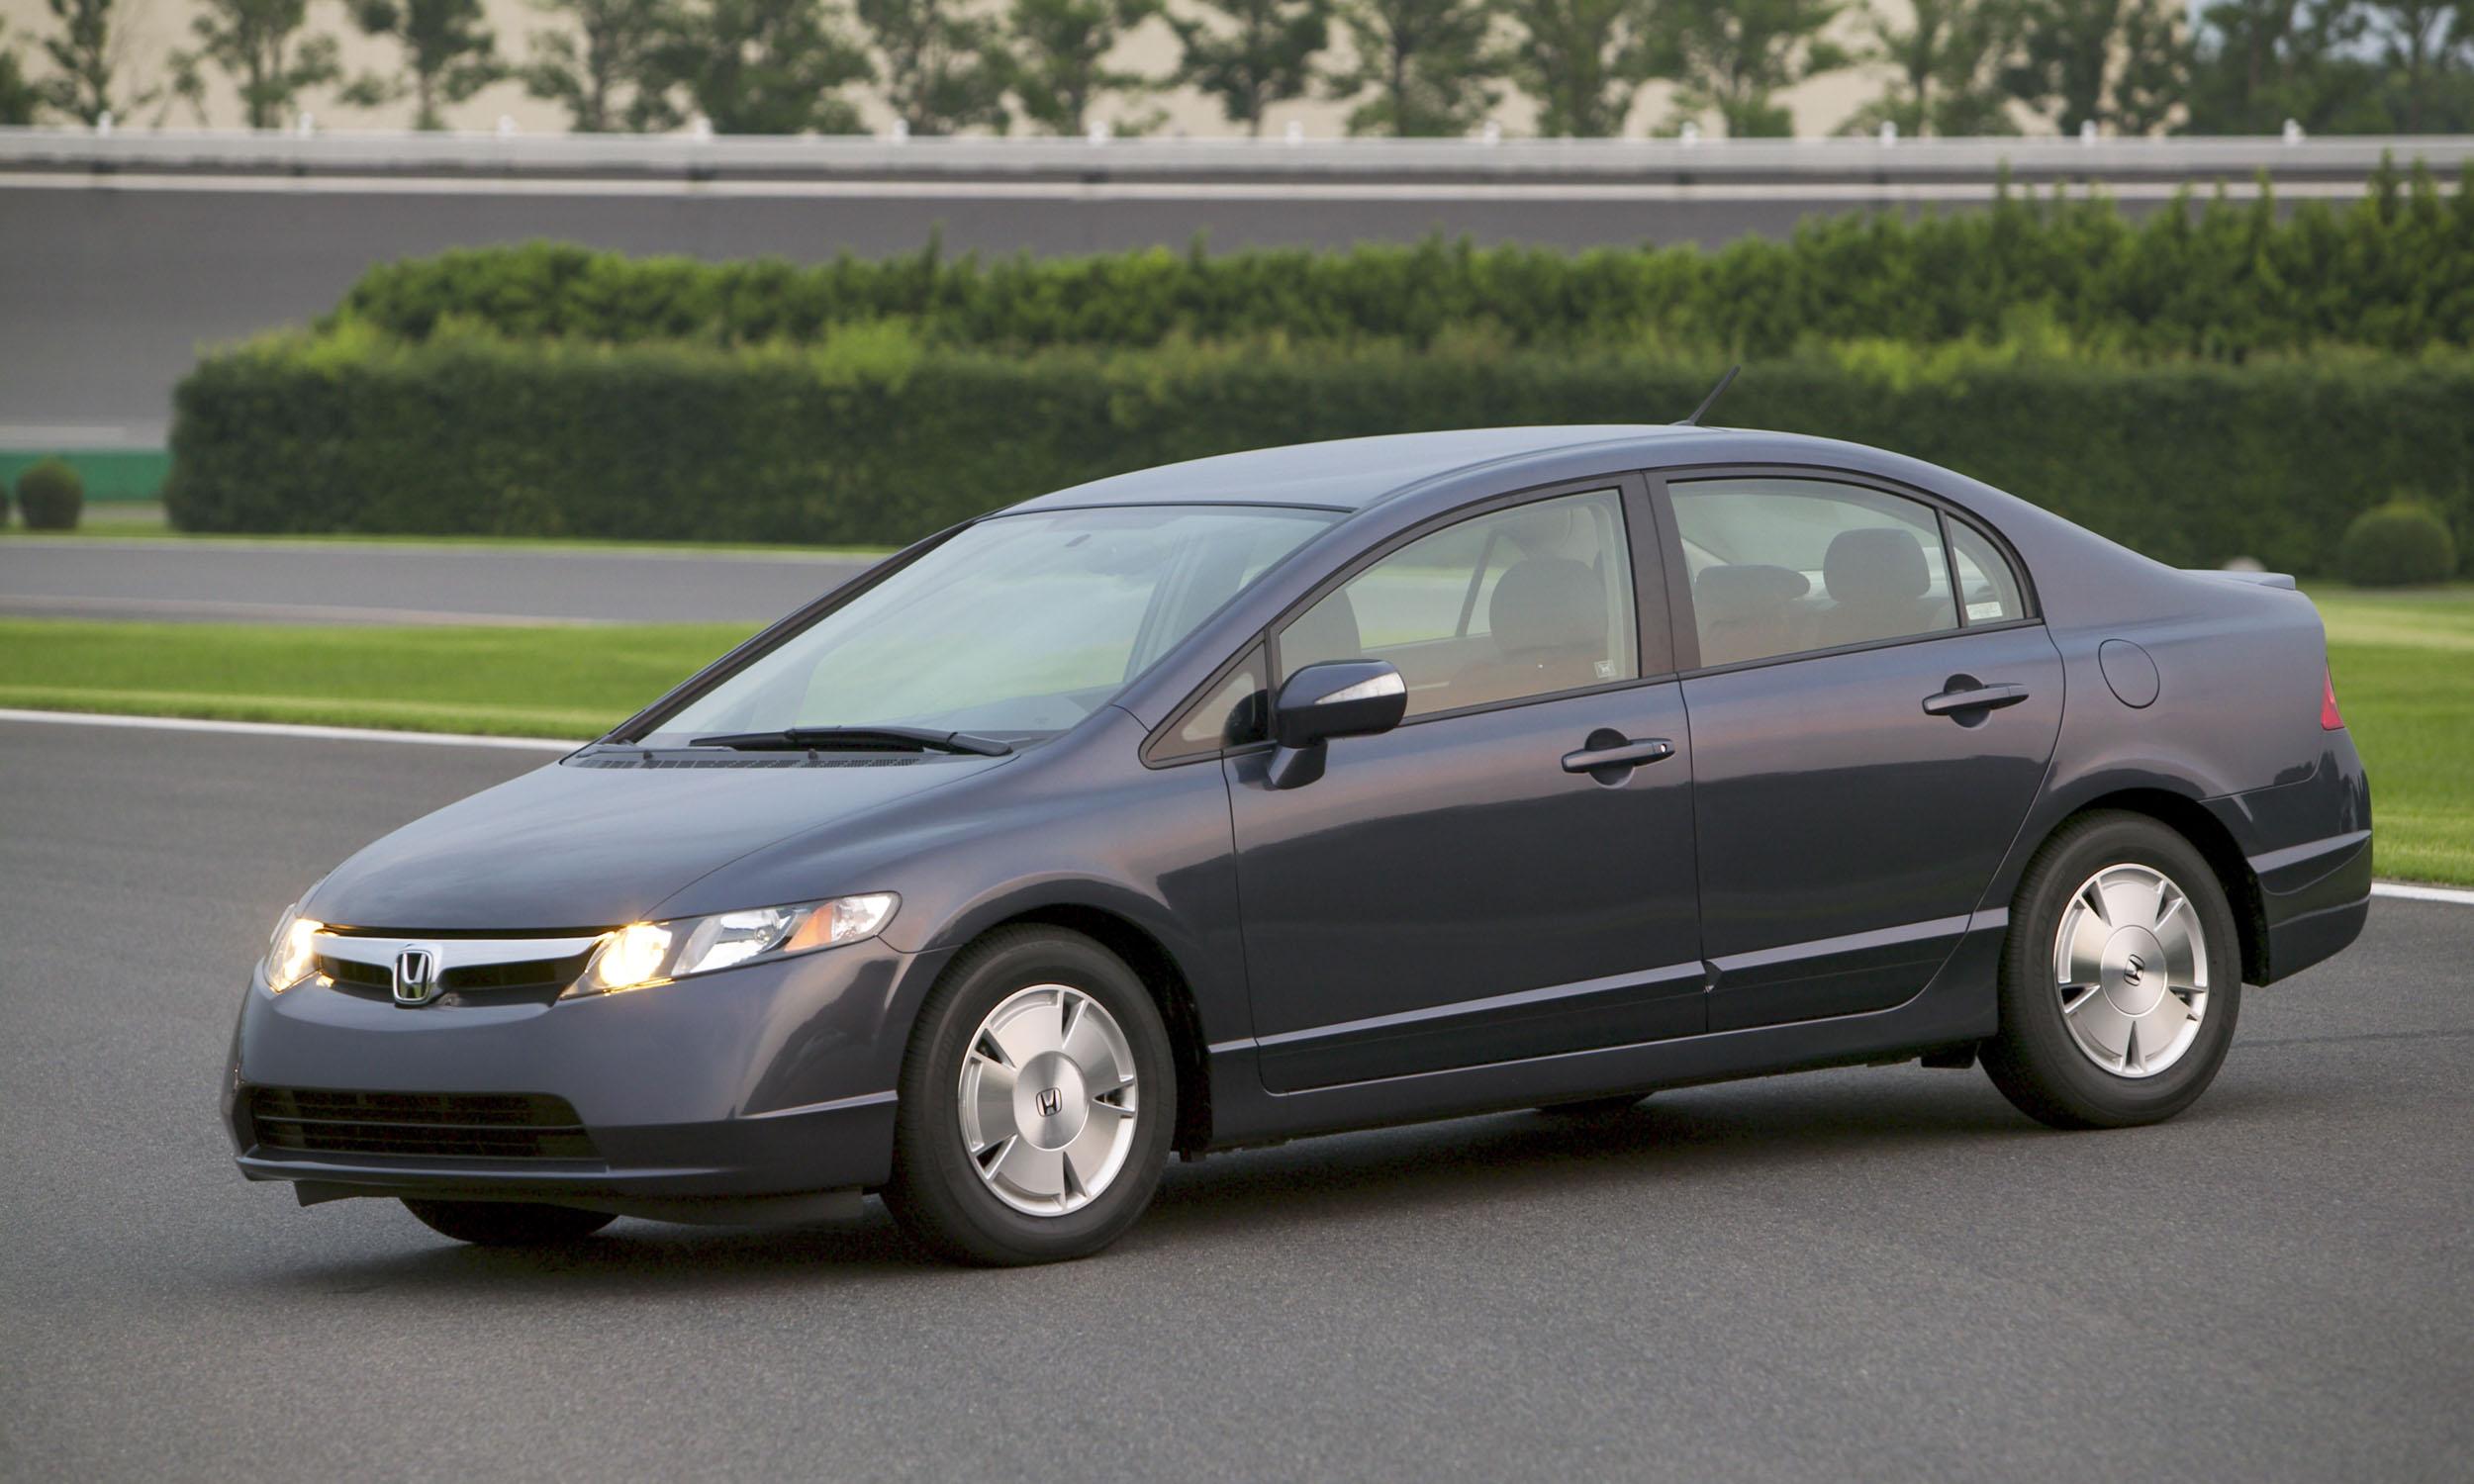 American Honda Motor Co Inc